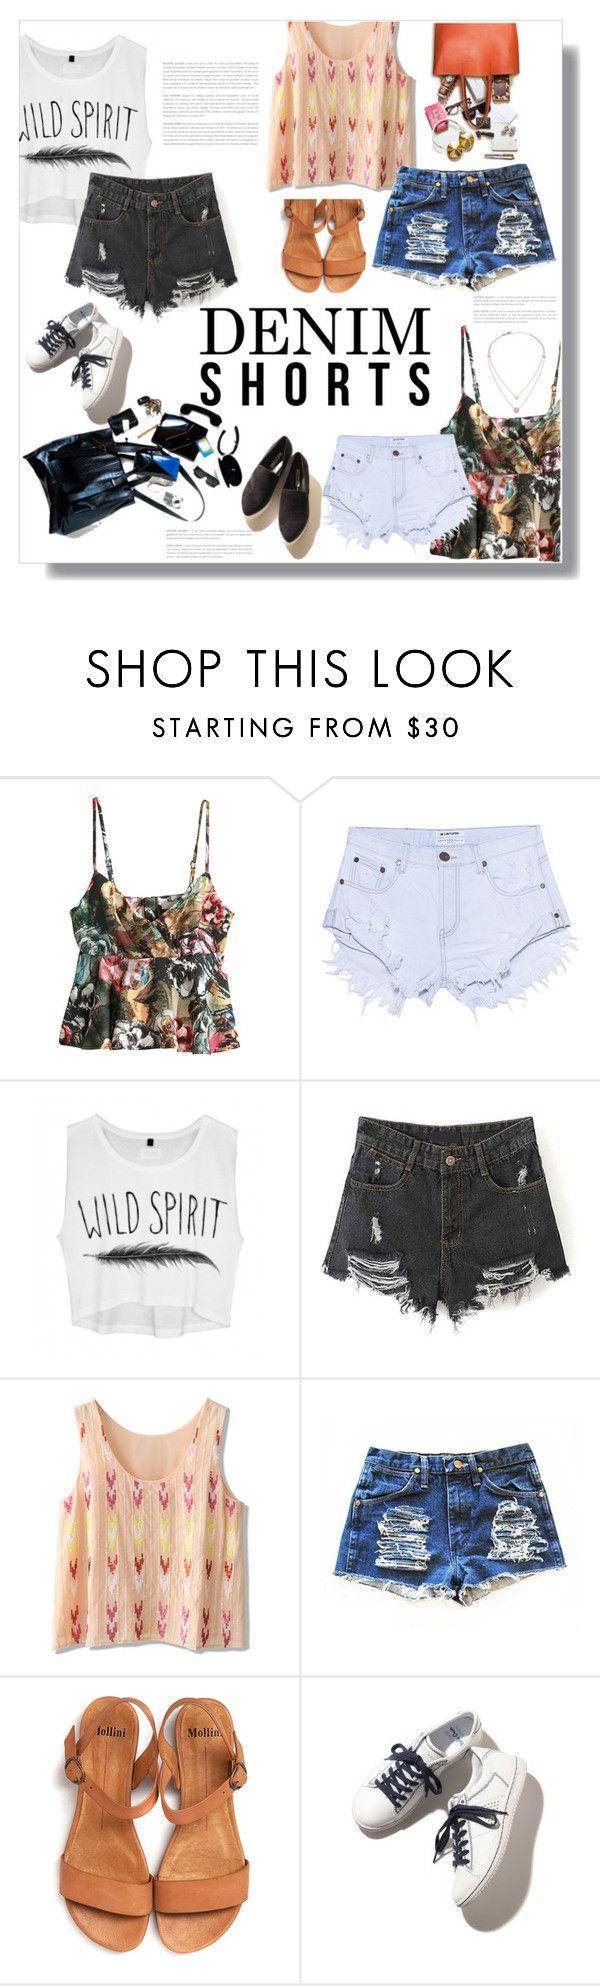 """Denim Shorts.."" by nadia-gadelmawla ❤ liked on Polyvore featuring H&M, OneTeaspoon, Chicwish, Michael Kors, jeanshorts, denimshorts and cutoffs"